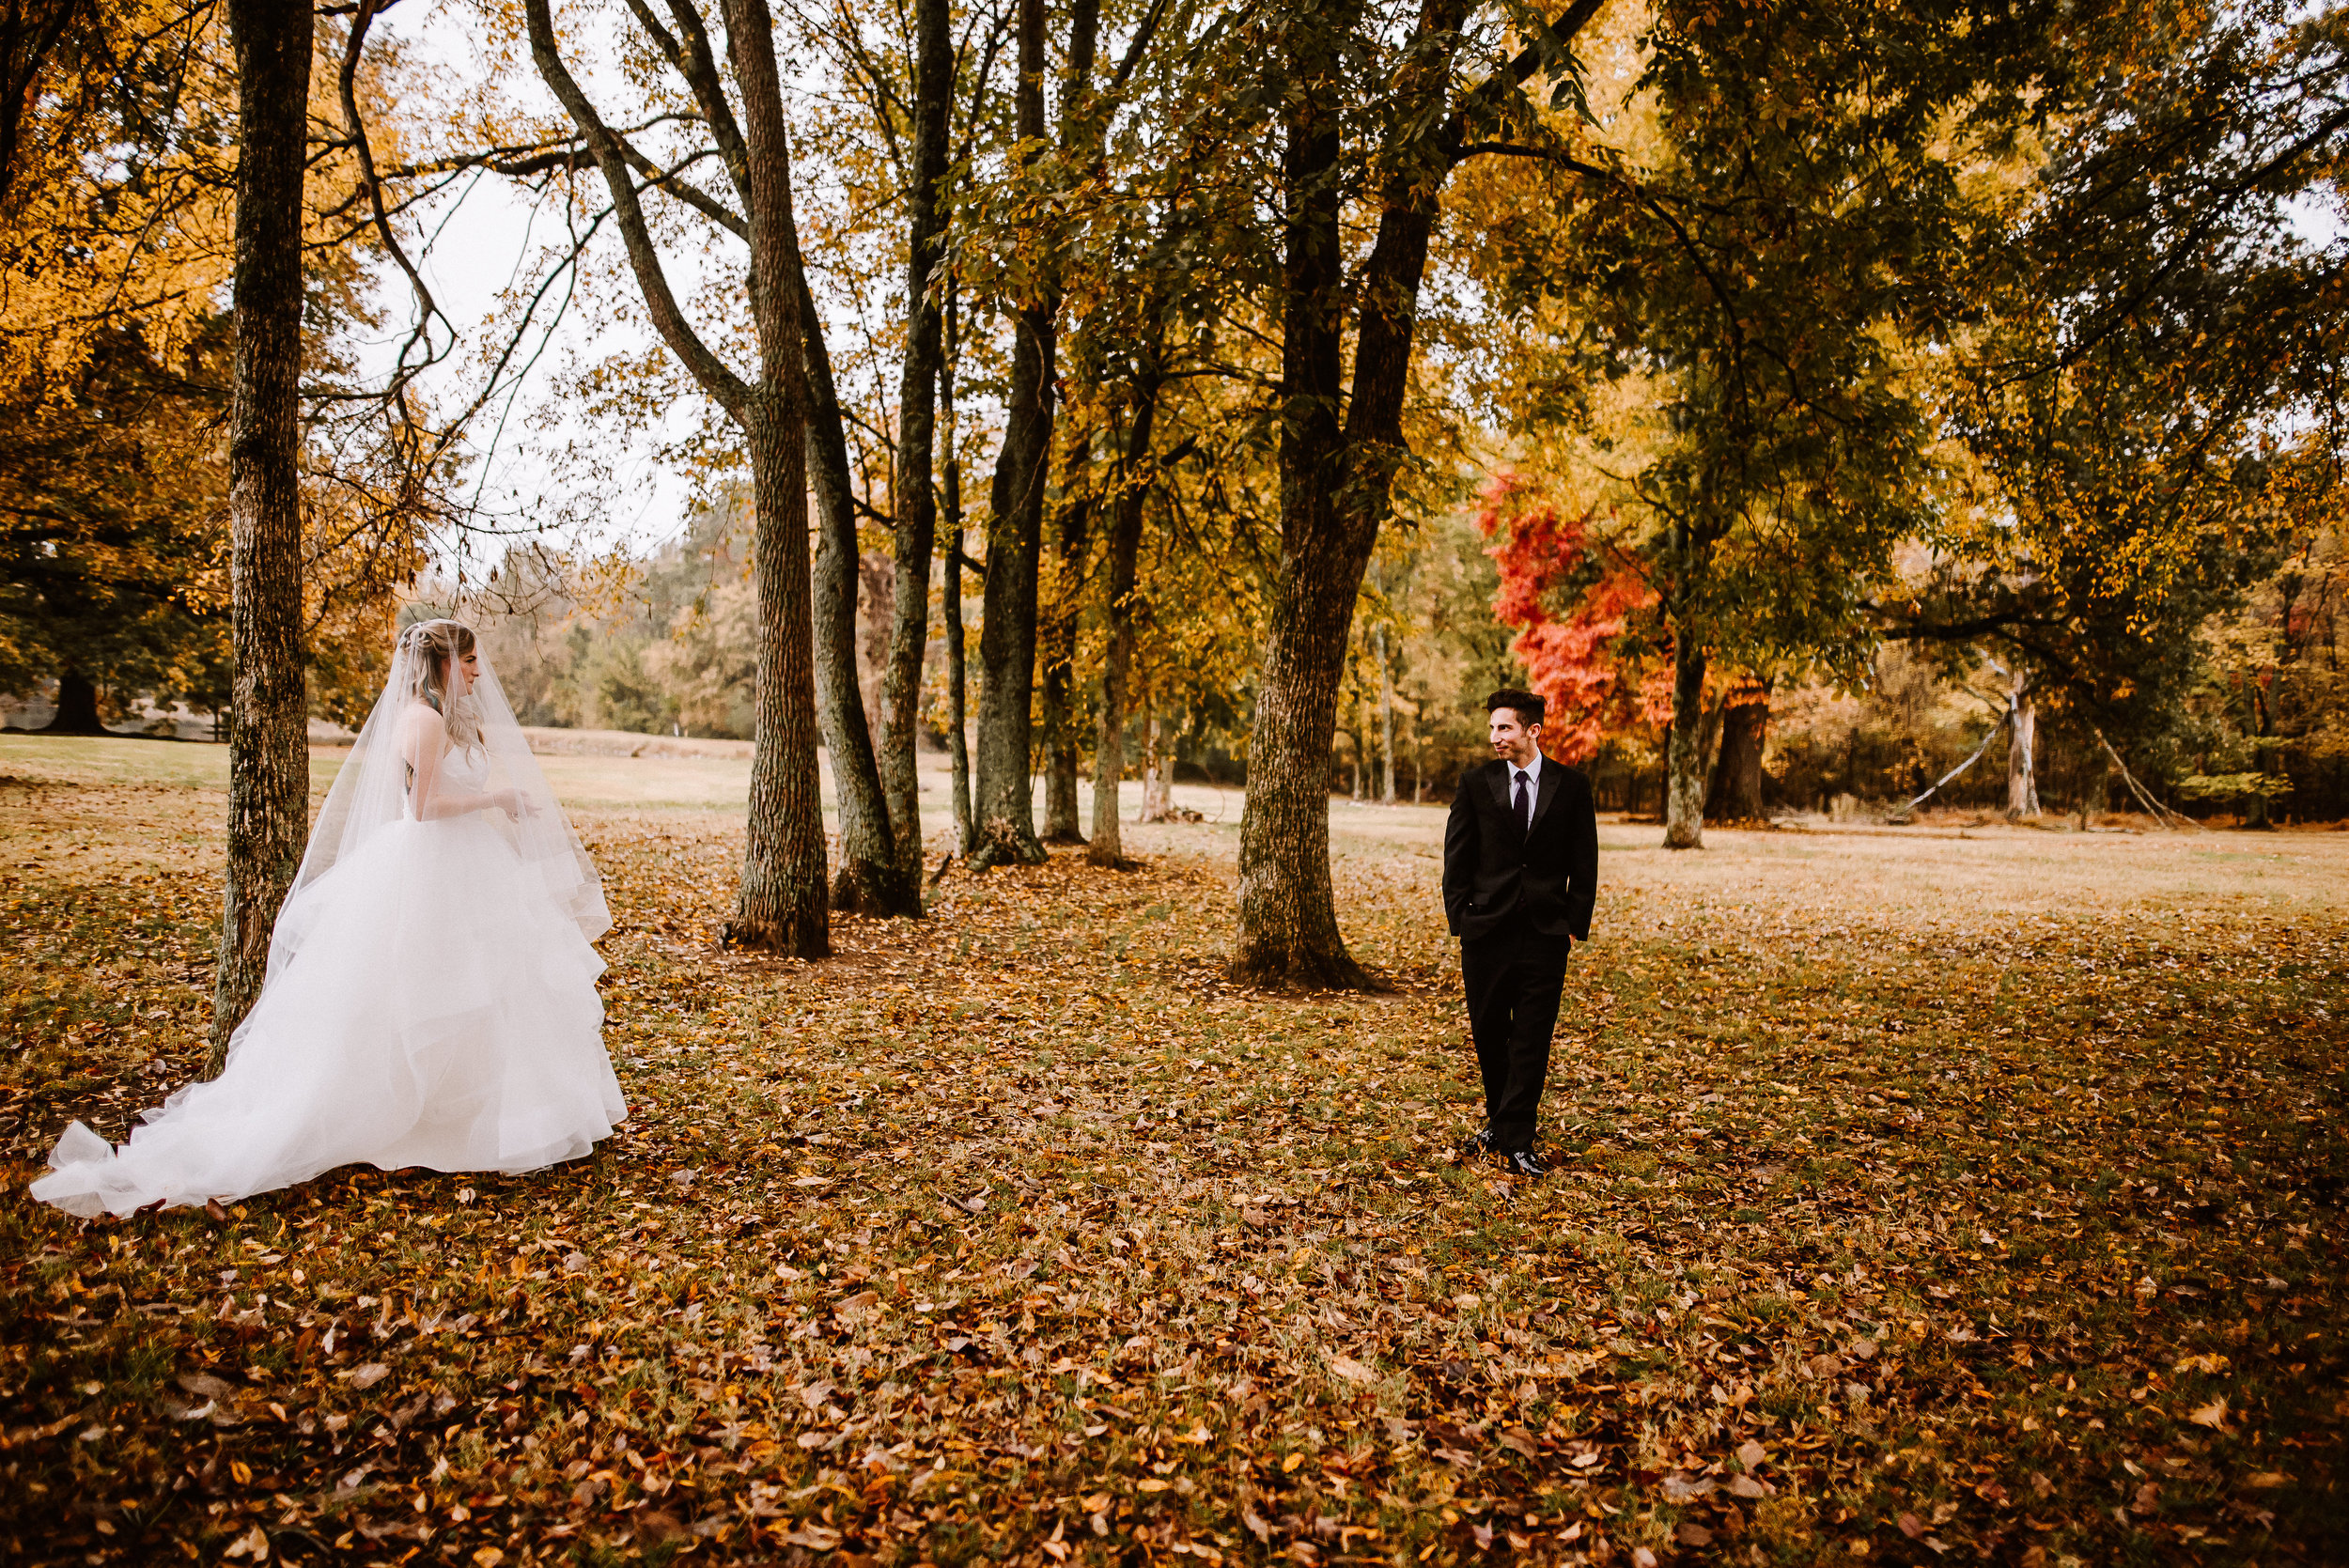 Lucchesi-Wedding_Shelby-Farms_Ashley-Benham-Photography-119.jpg